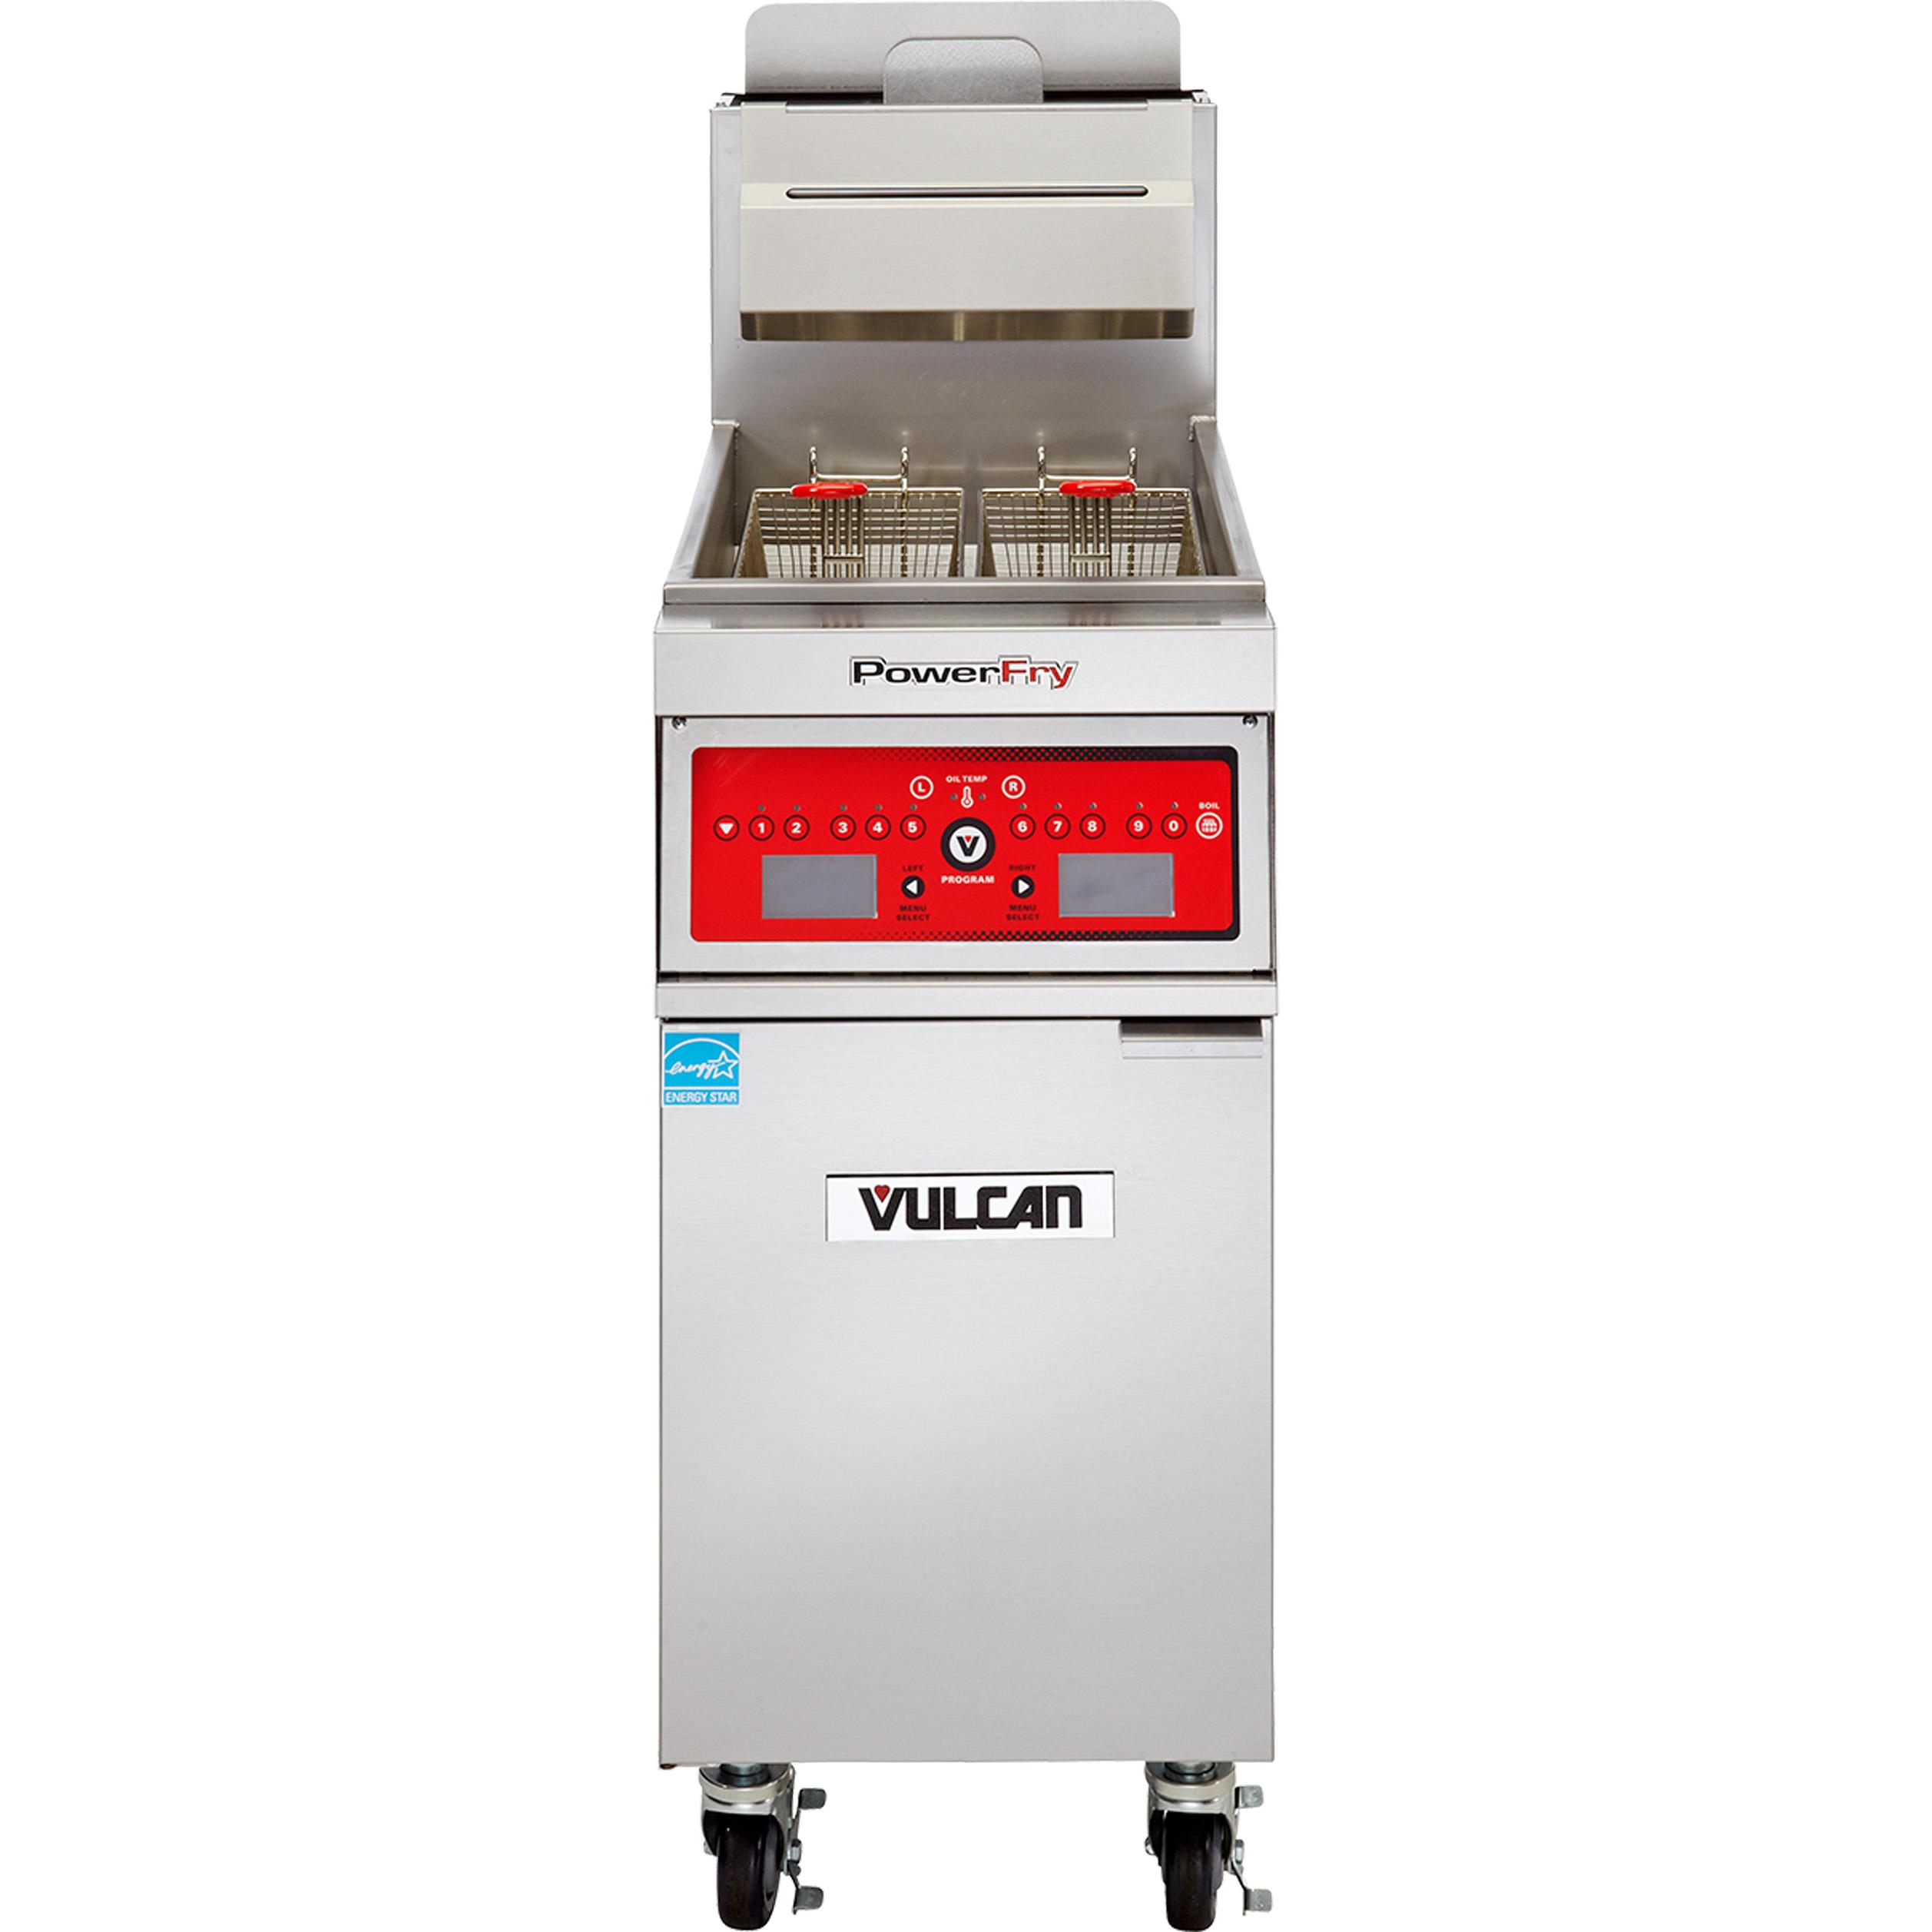 Vulcan 1VK85C fryer, gas, floor model, full pot